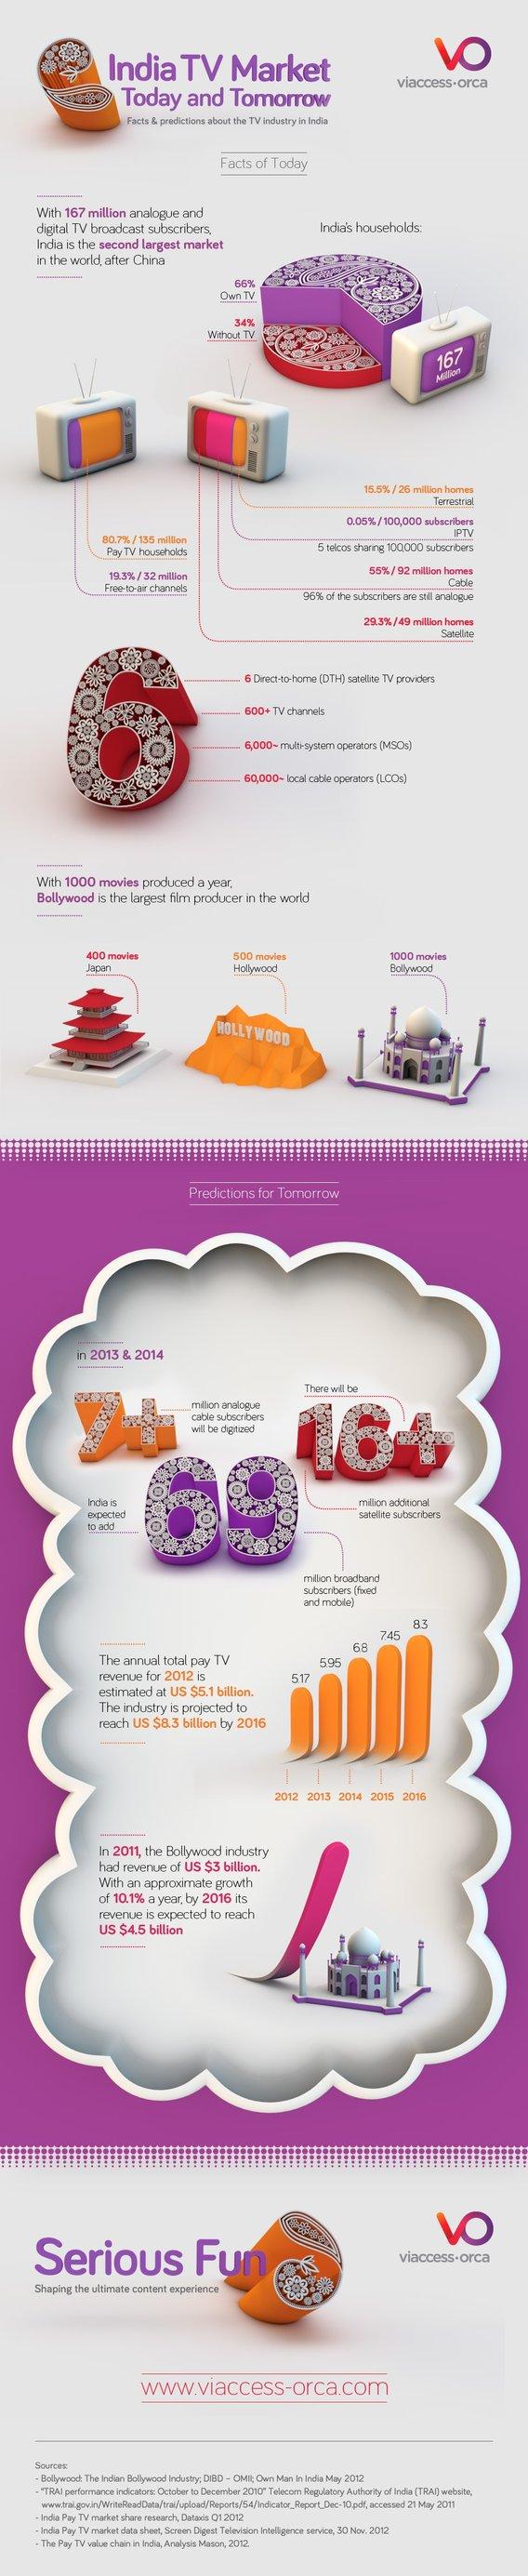 VO_India_Infographic (1).jpg